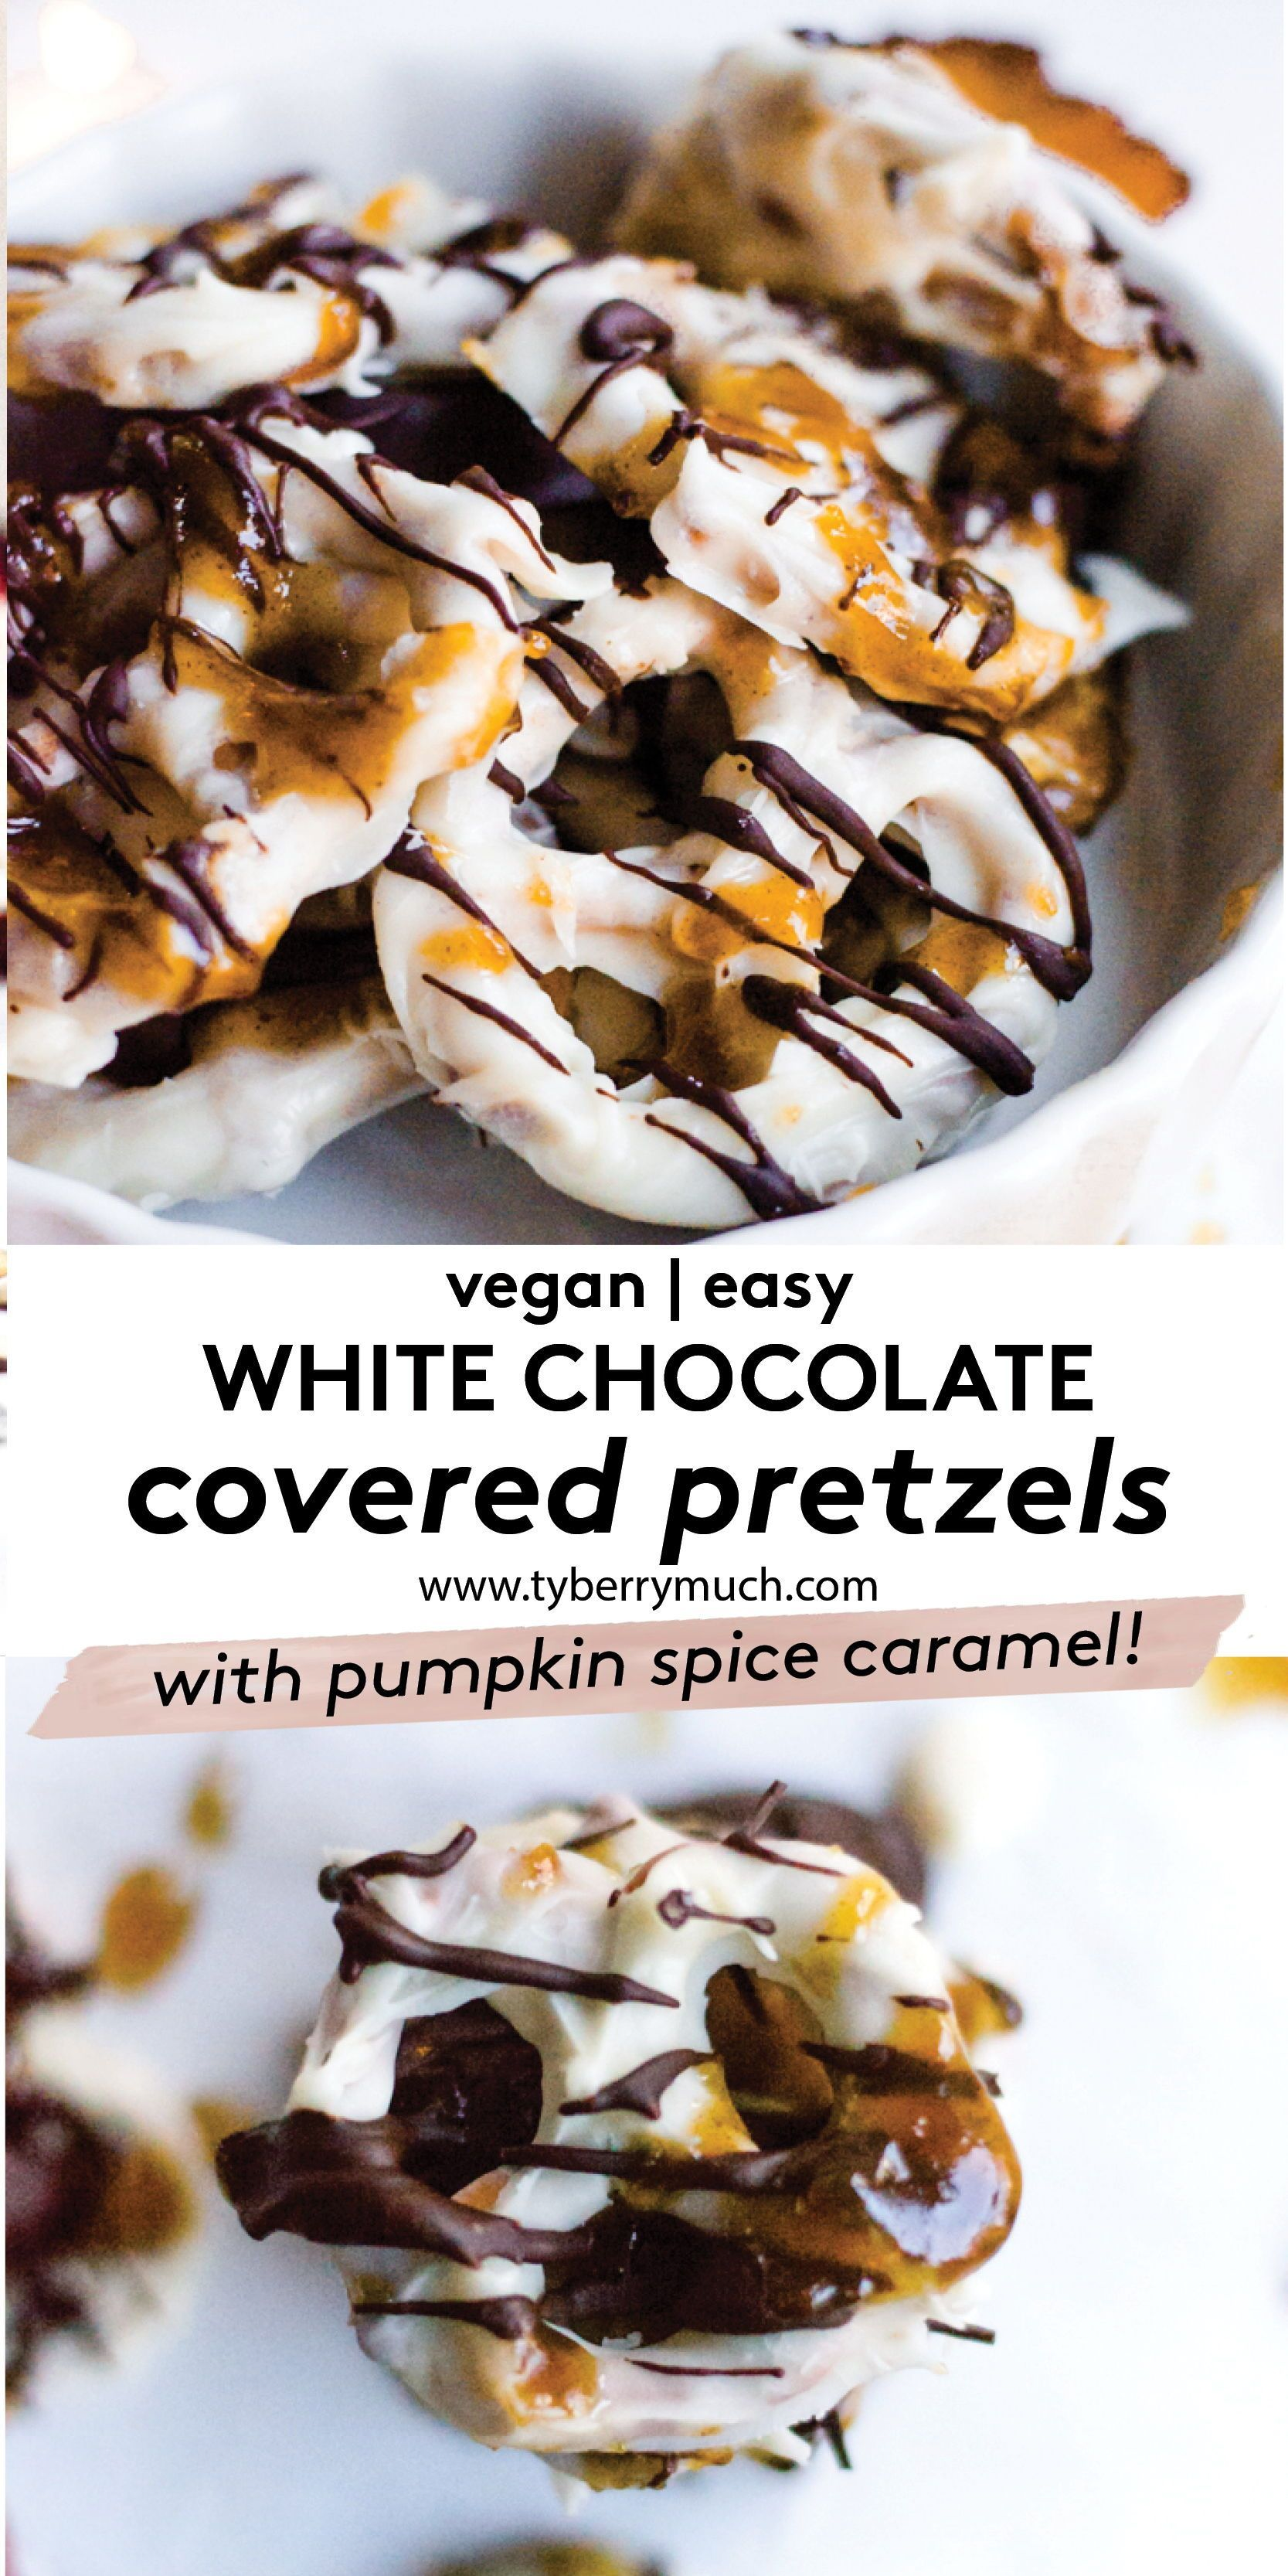 Vegan White Chocolate Covered Pretzels With Pumpkin Spice Caramel Recipe In 2020 Vegan Thanksgiving Dessert Healthy Vegan Desserts Vegan Desserts